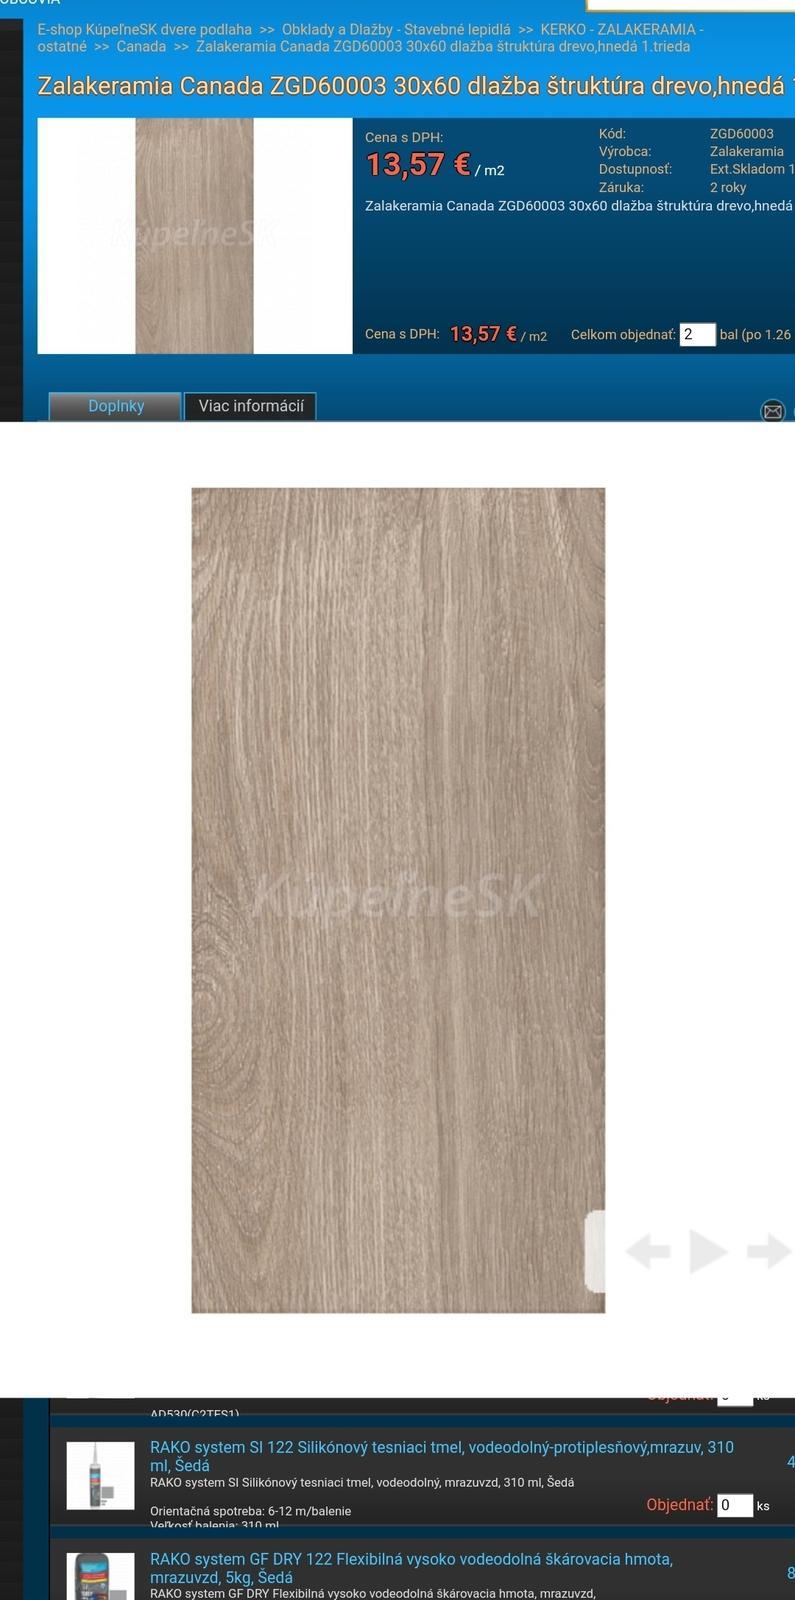 Zalakeramia Canada ZGD60003 30x60 - Obrázok č. 1